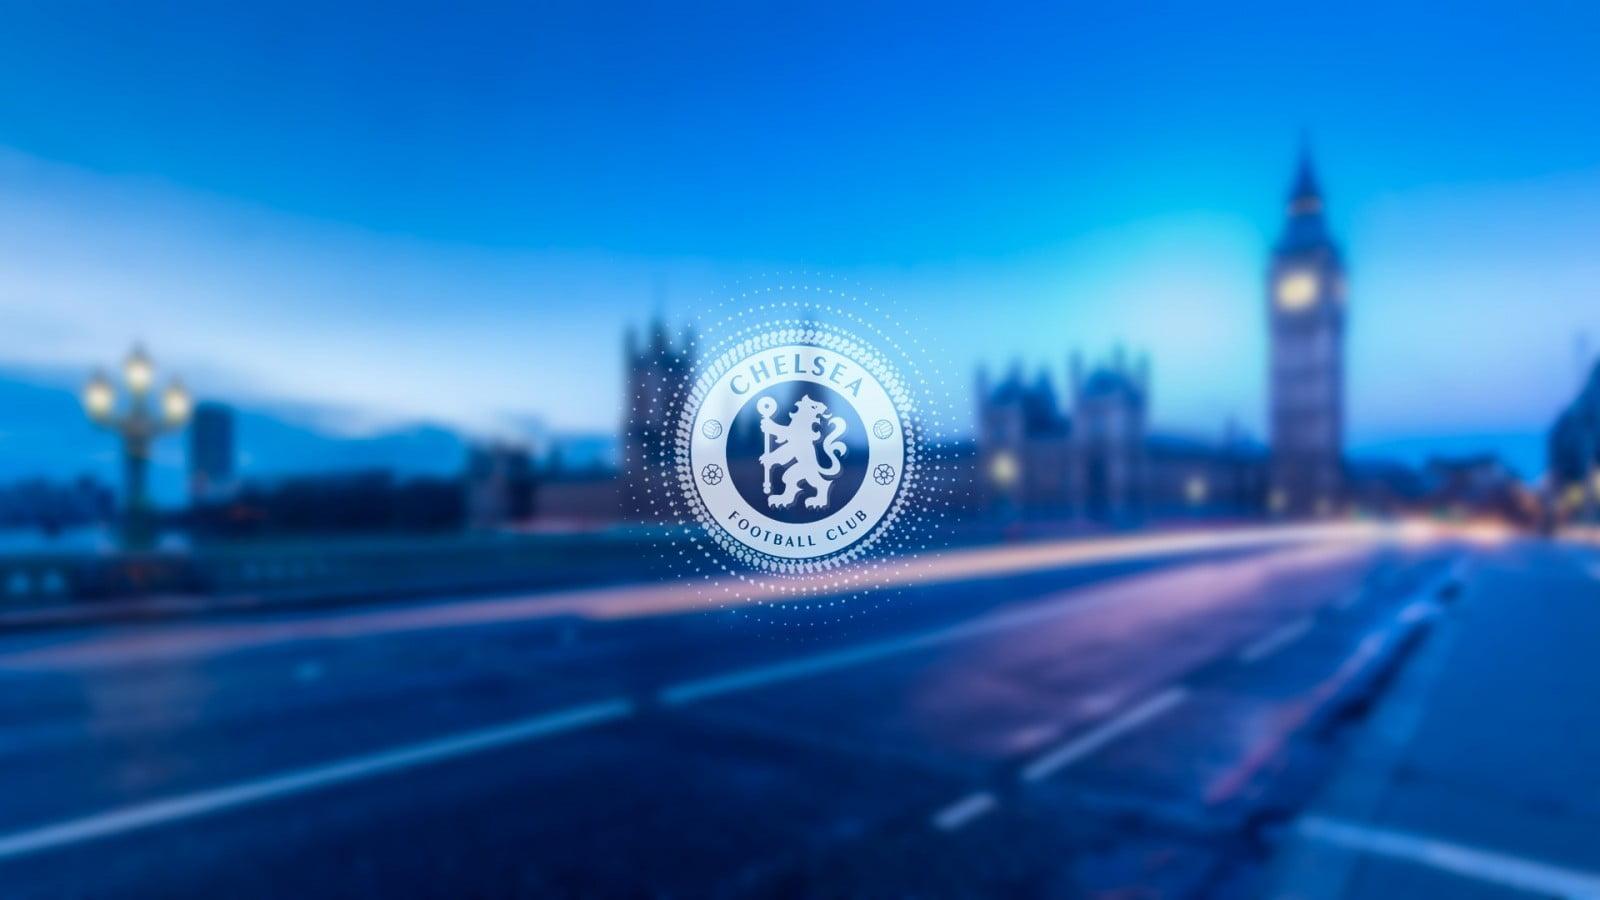 Chelsea football club wallpaper Chelsea FC HD wallpaper 1600x900